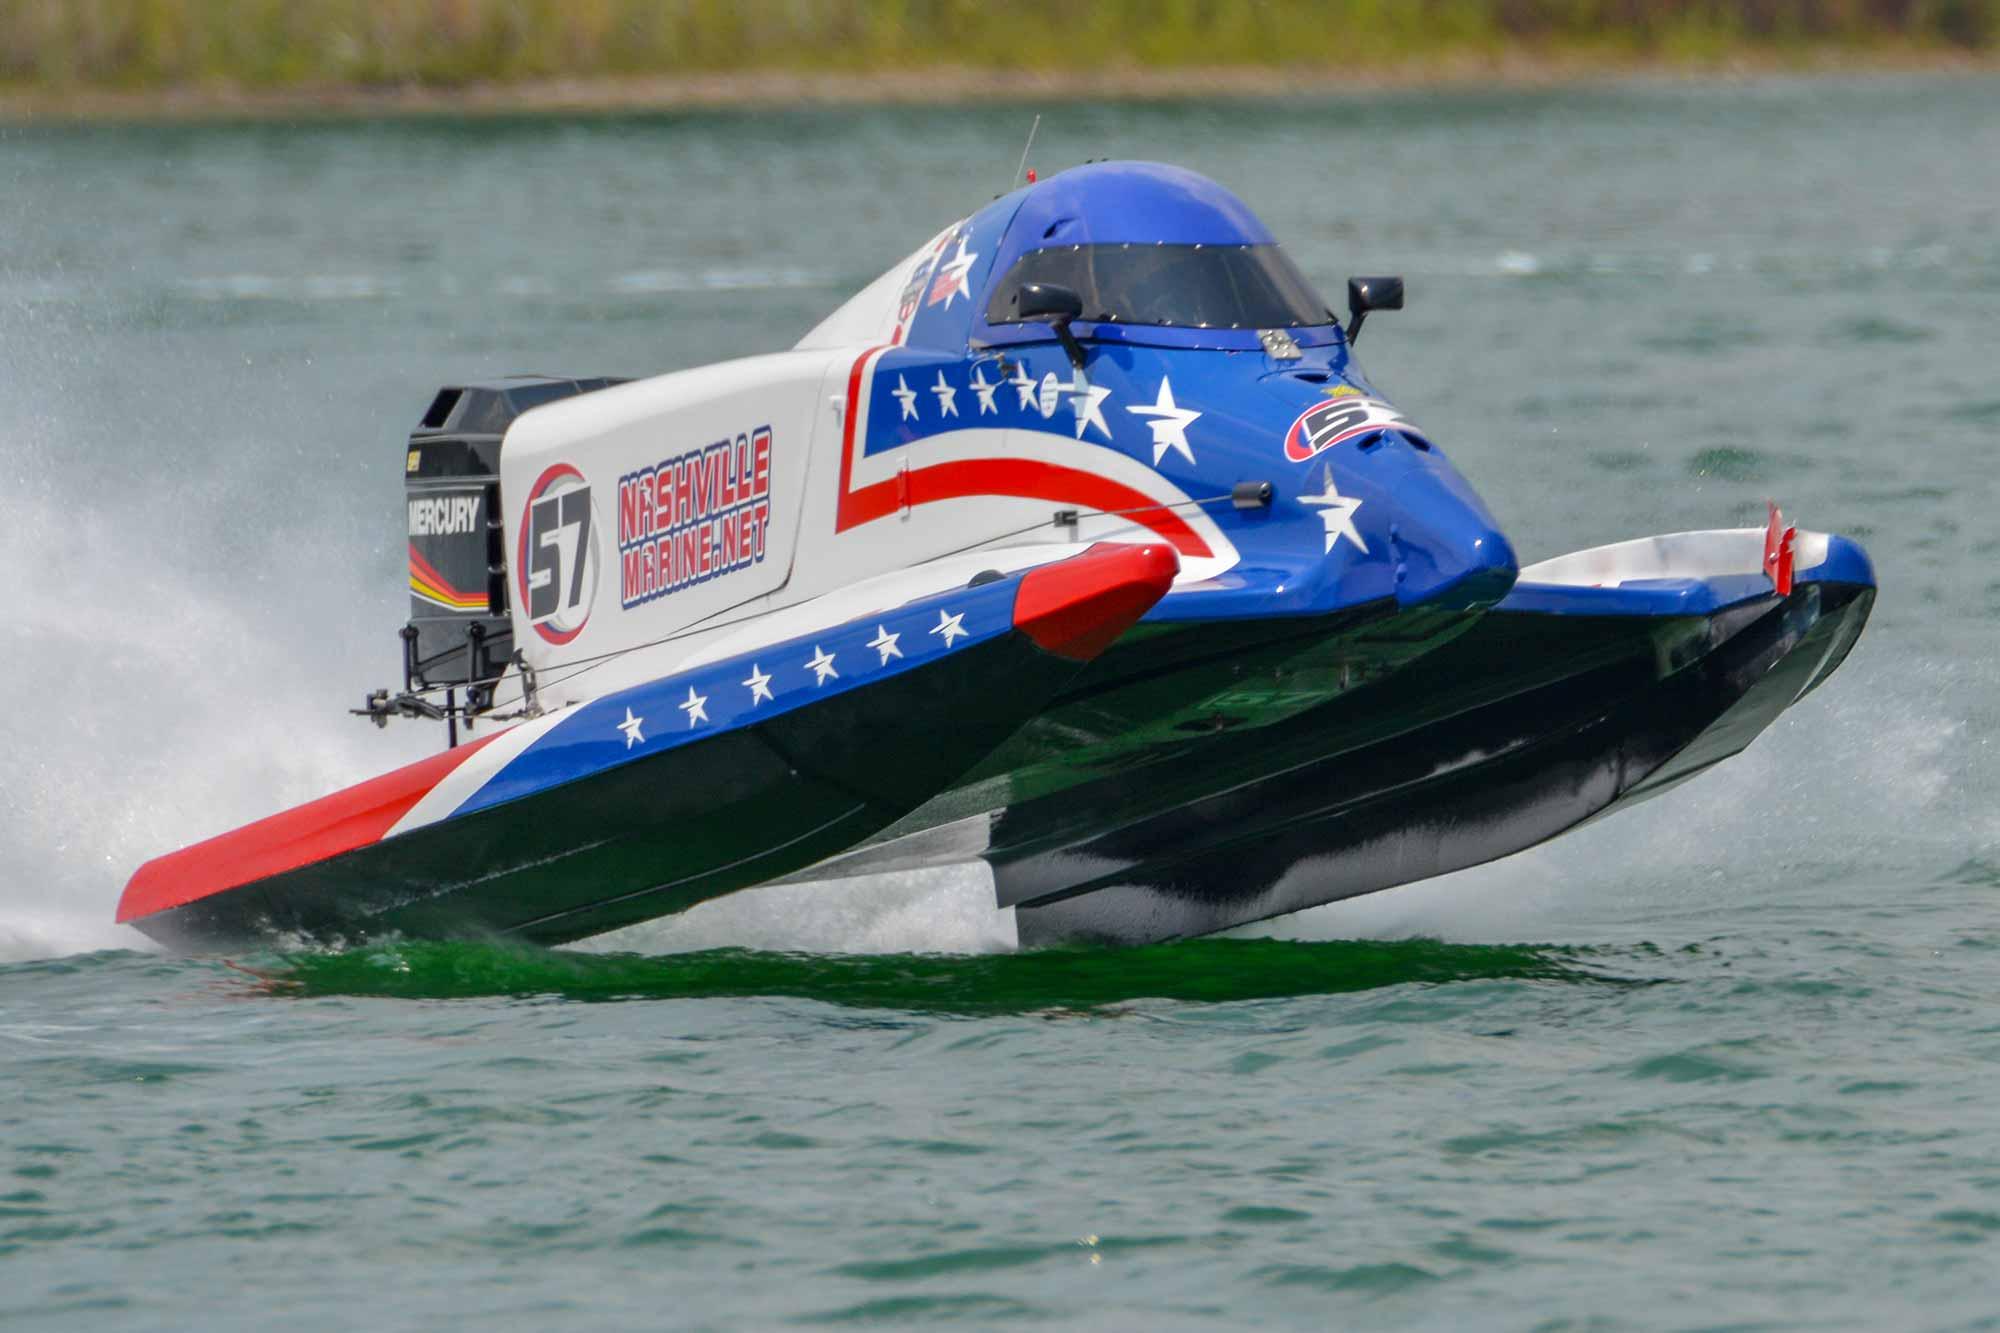 McMurray-Racing-Nashvill-Marine-2021-Springfield-F1-Race-19